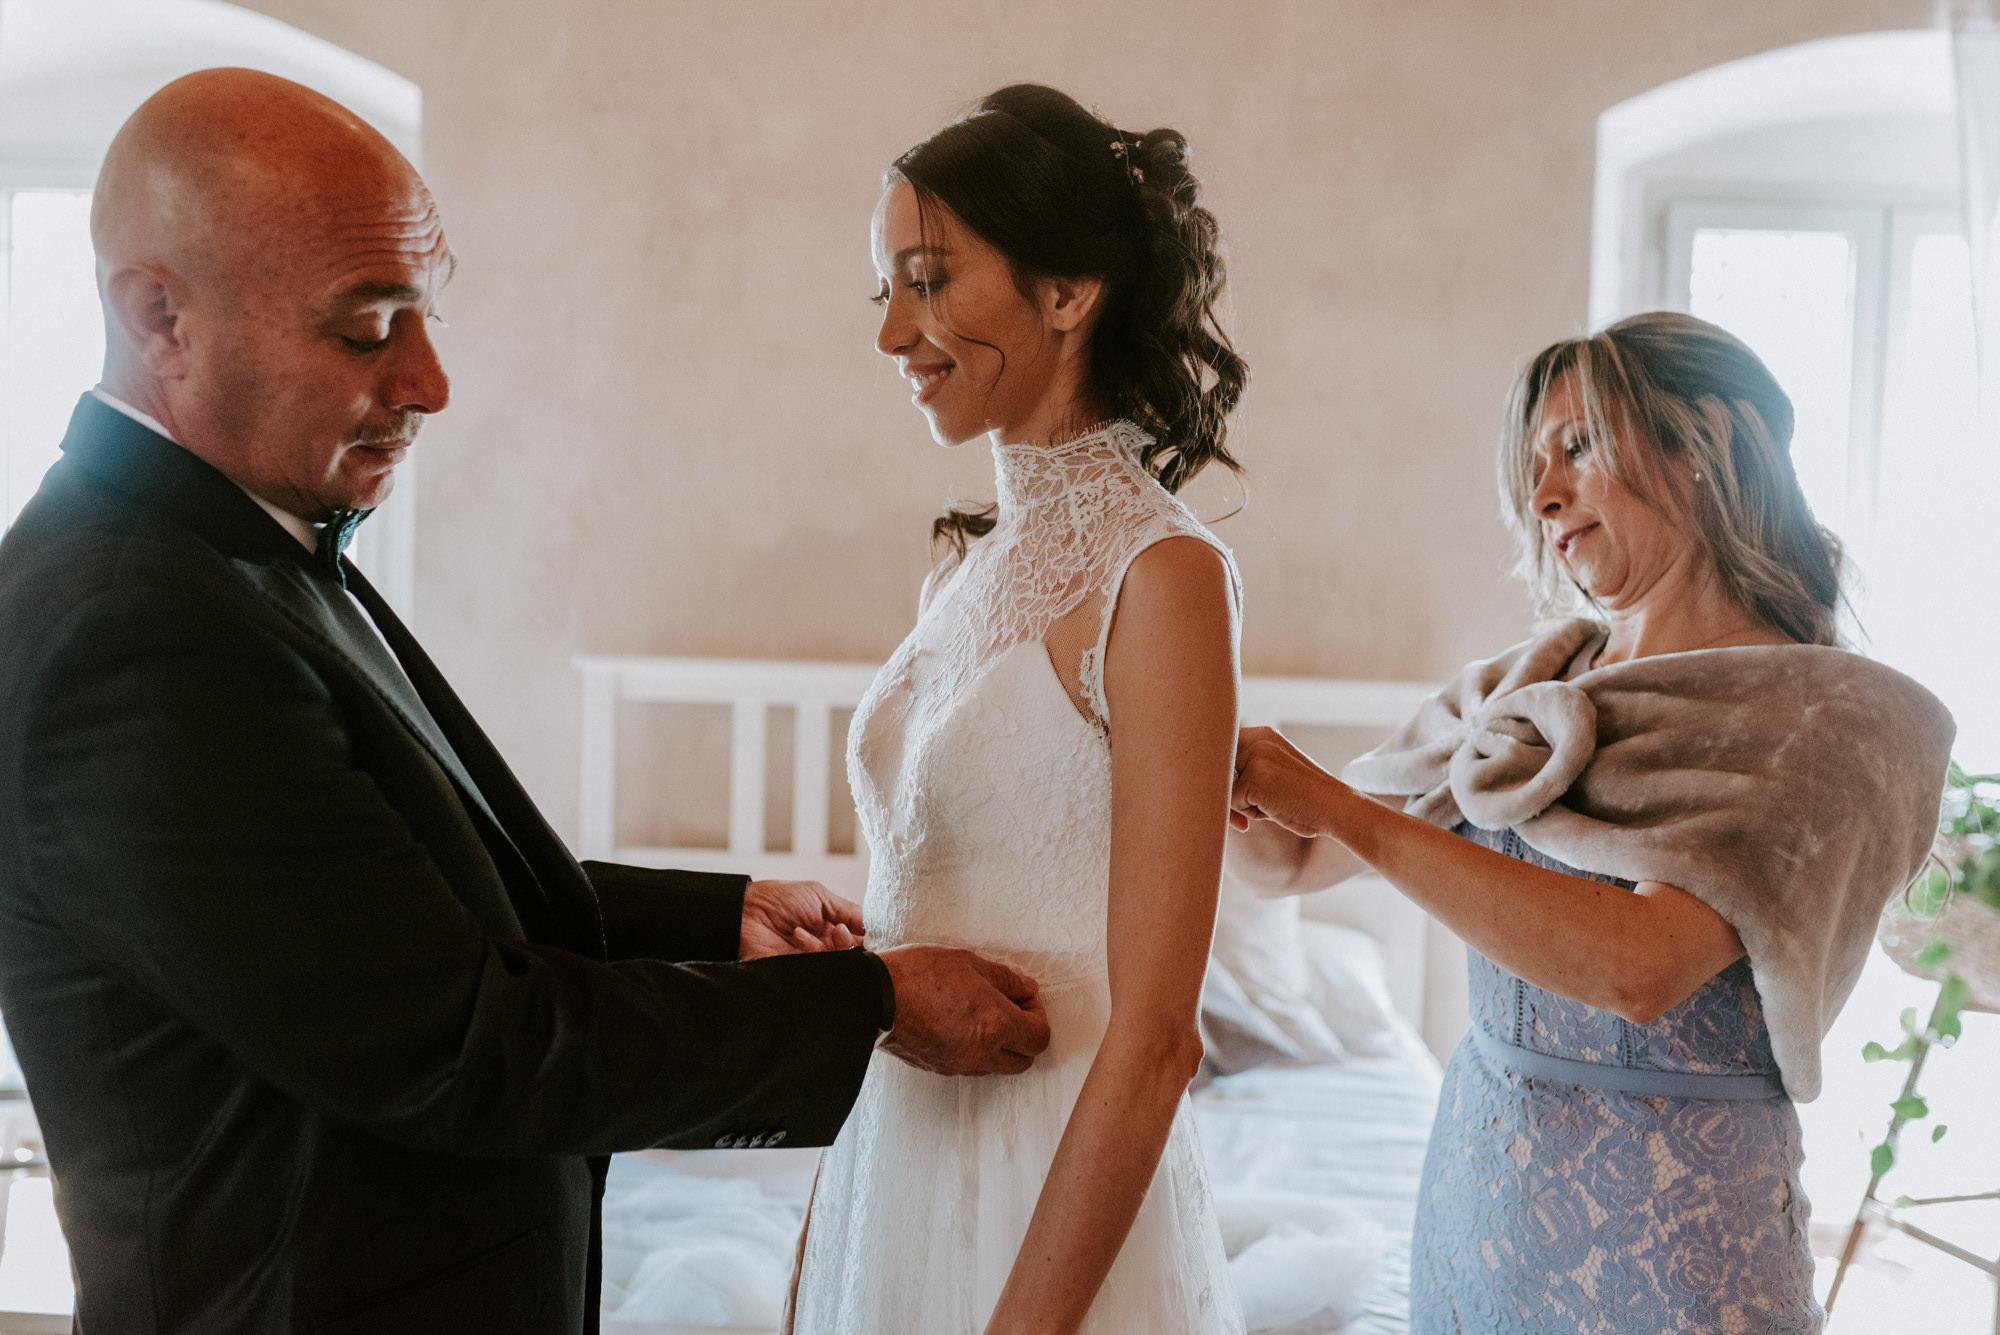 FOTO+PHOTO+BODA+WEDDING+ITALIA+ITALY+MAURICIO+GARAY+MAURICIOGARAY+WEDDINPHOTOGRAPHER+FOTOGRAFODEBODA-332.jpg